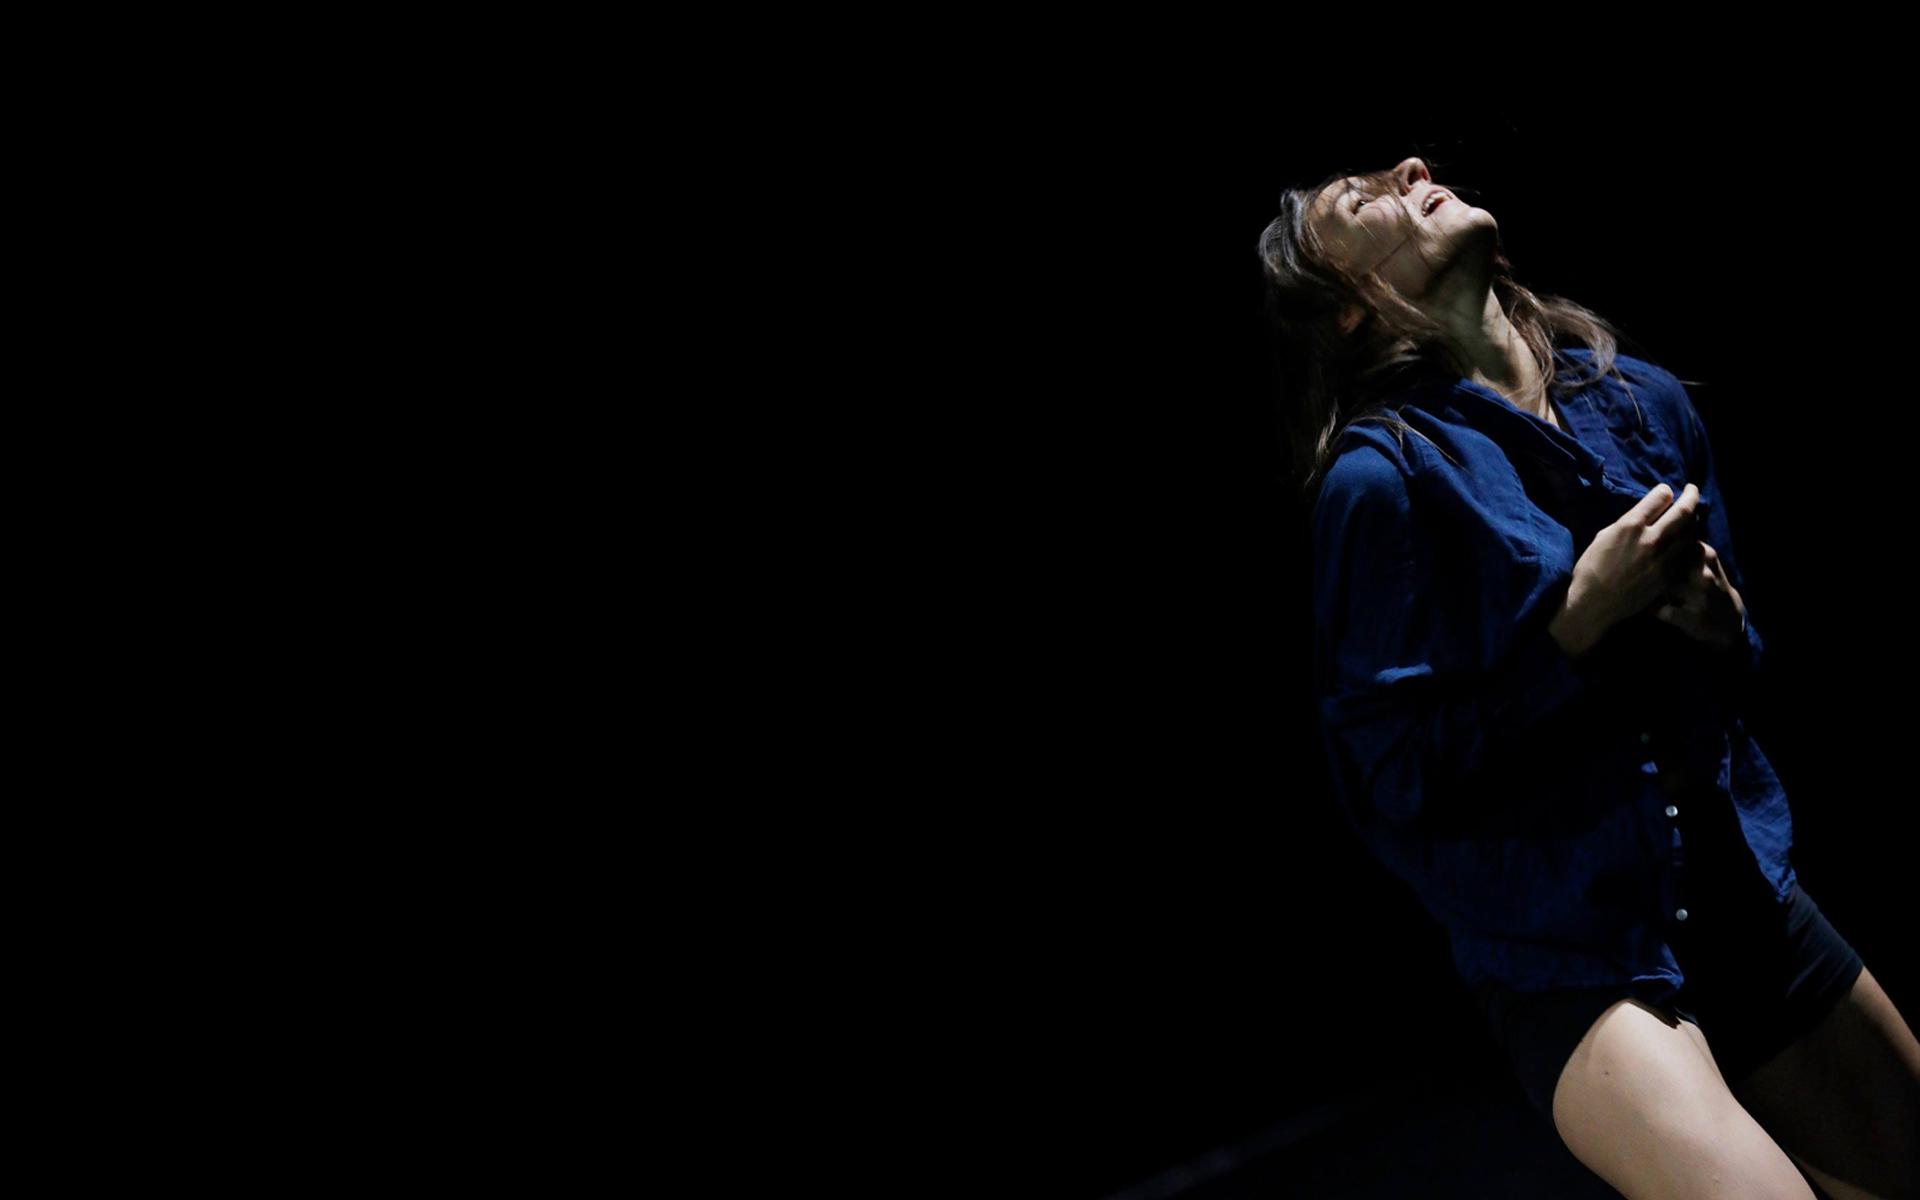 Dancer Anna Kempin buttoning her shirt during her InBetWeEn A Shock dance performance at Center for Contemporary Dance